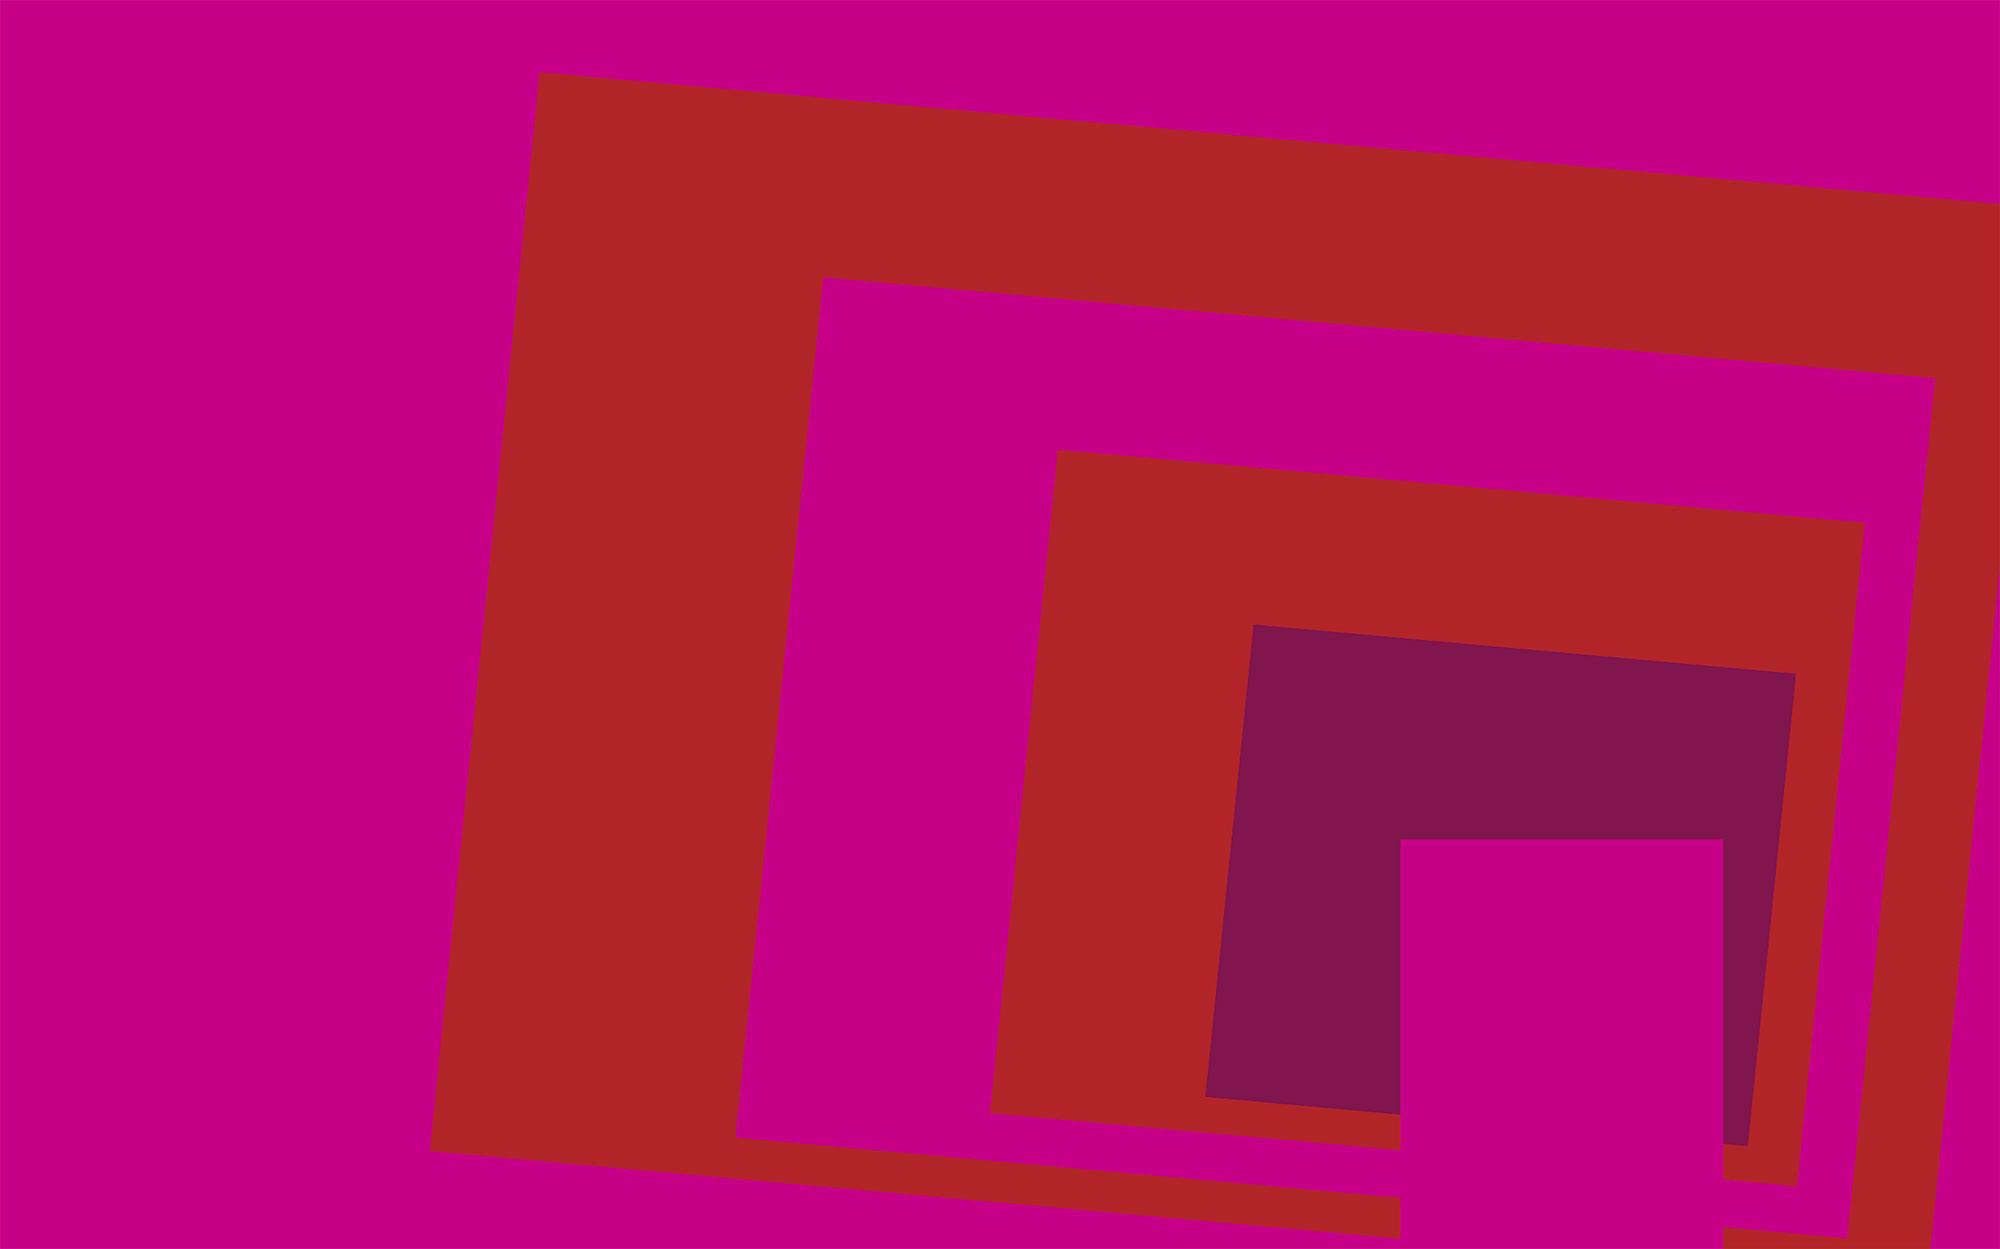 Blocking Oblique pink-red